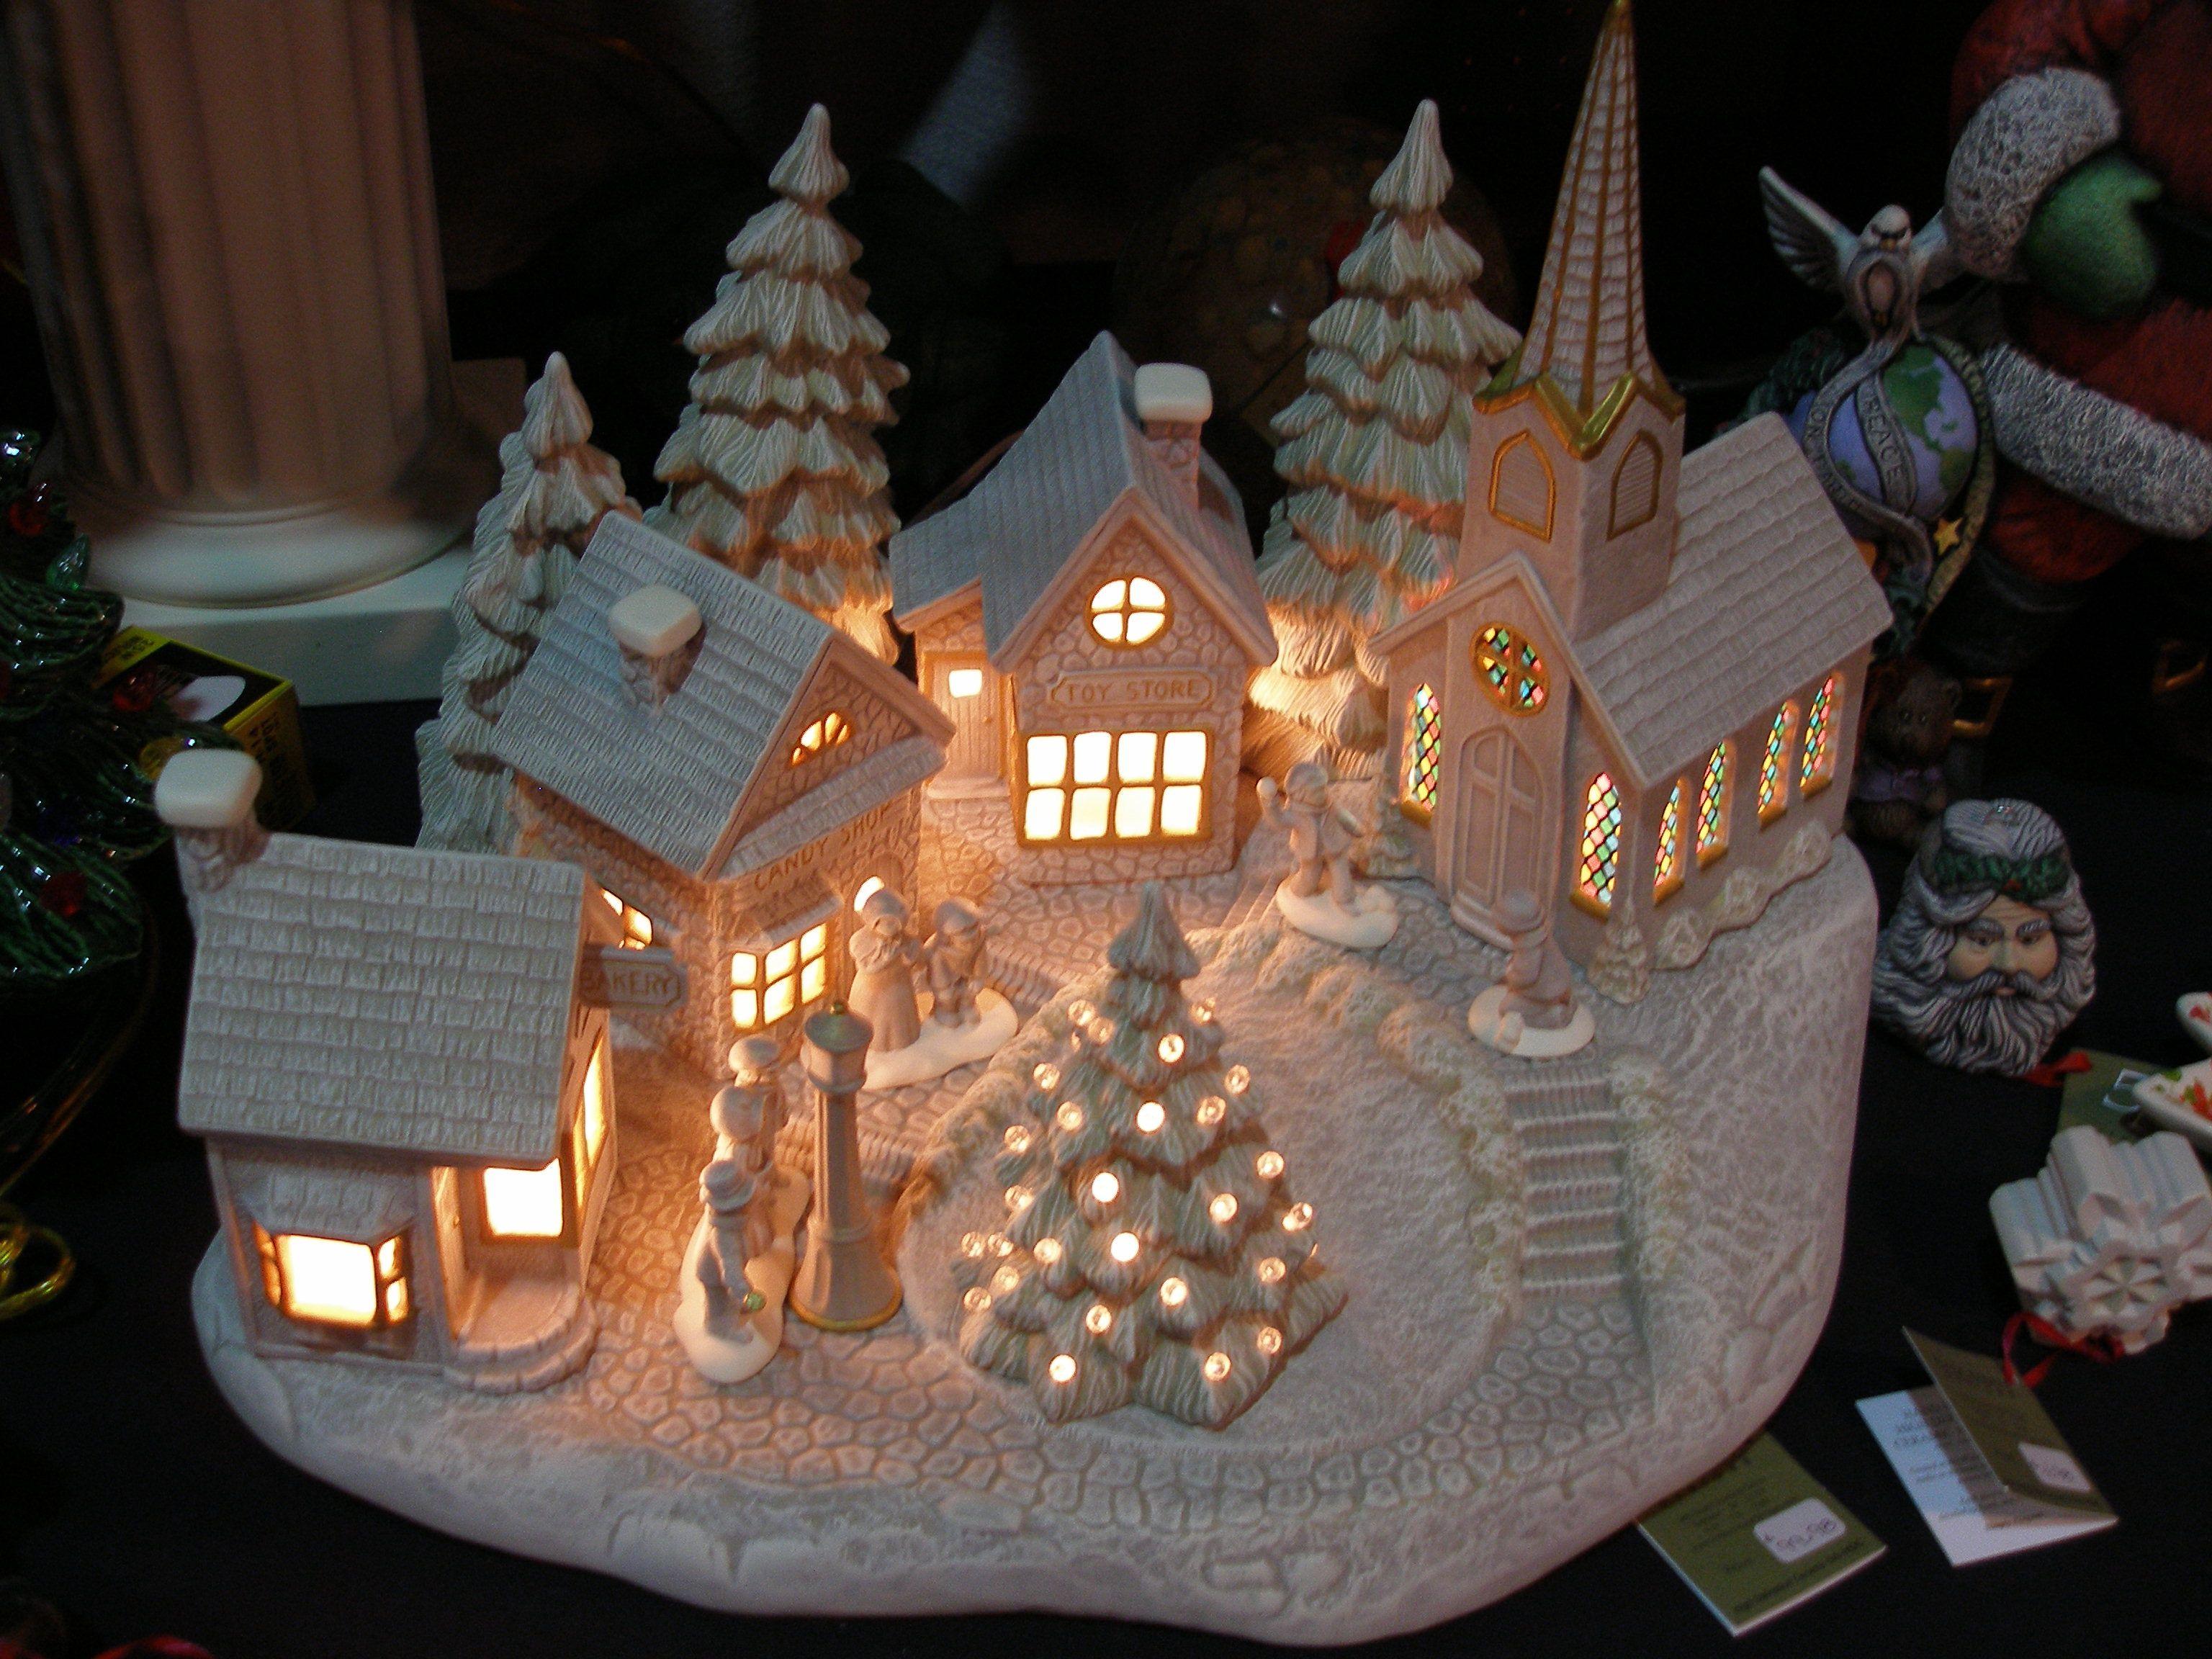 26 Best Ceramic Bisque Project Ideas Images On Pinterest | Ceramic Bisque,  Project Ideas And Christmas Villages